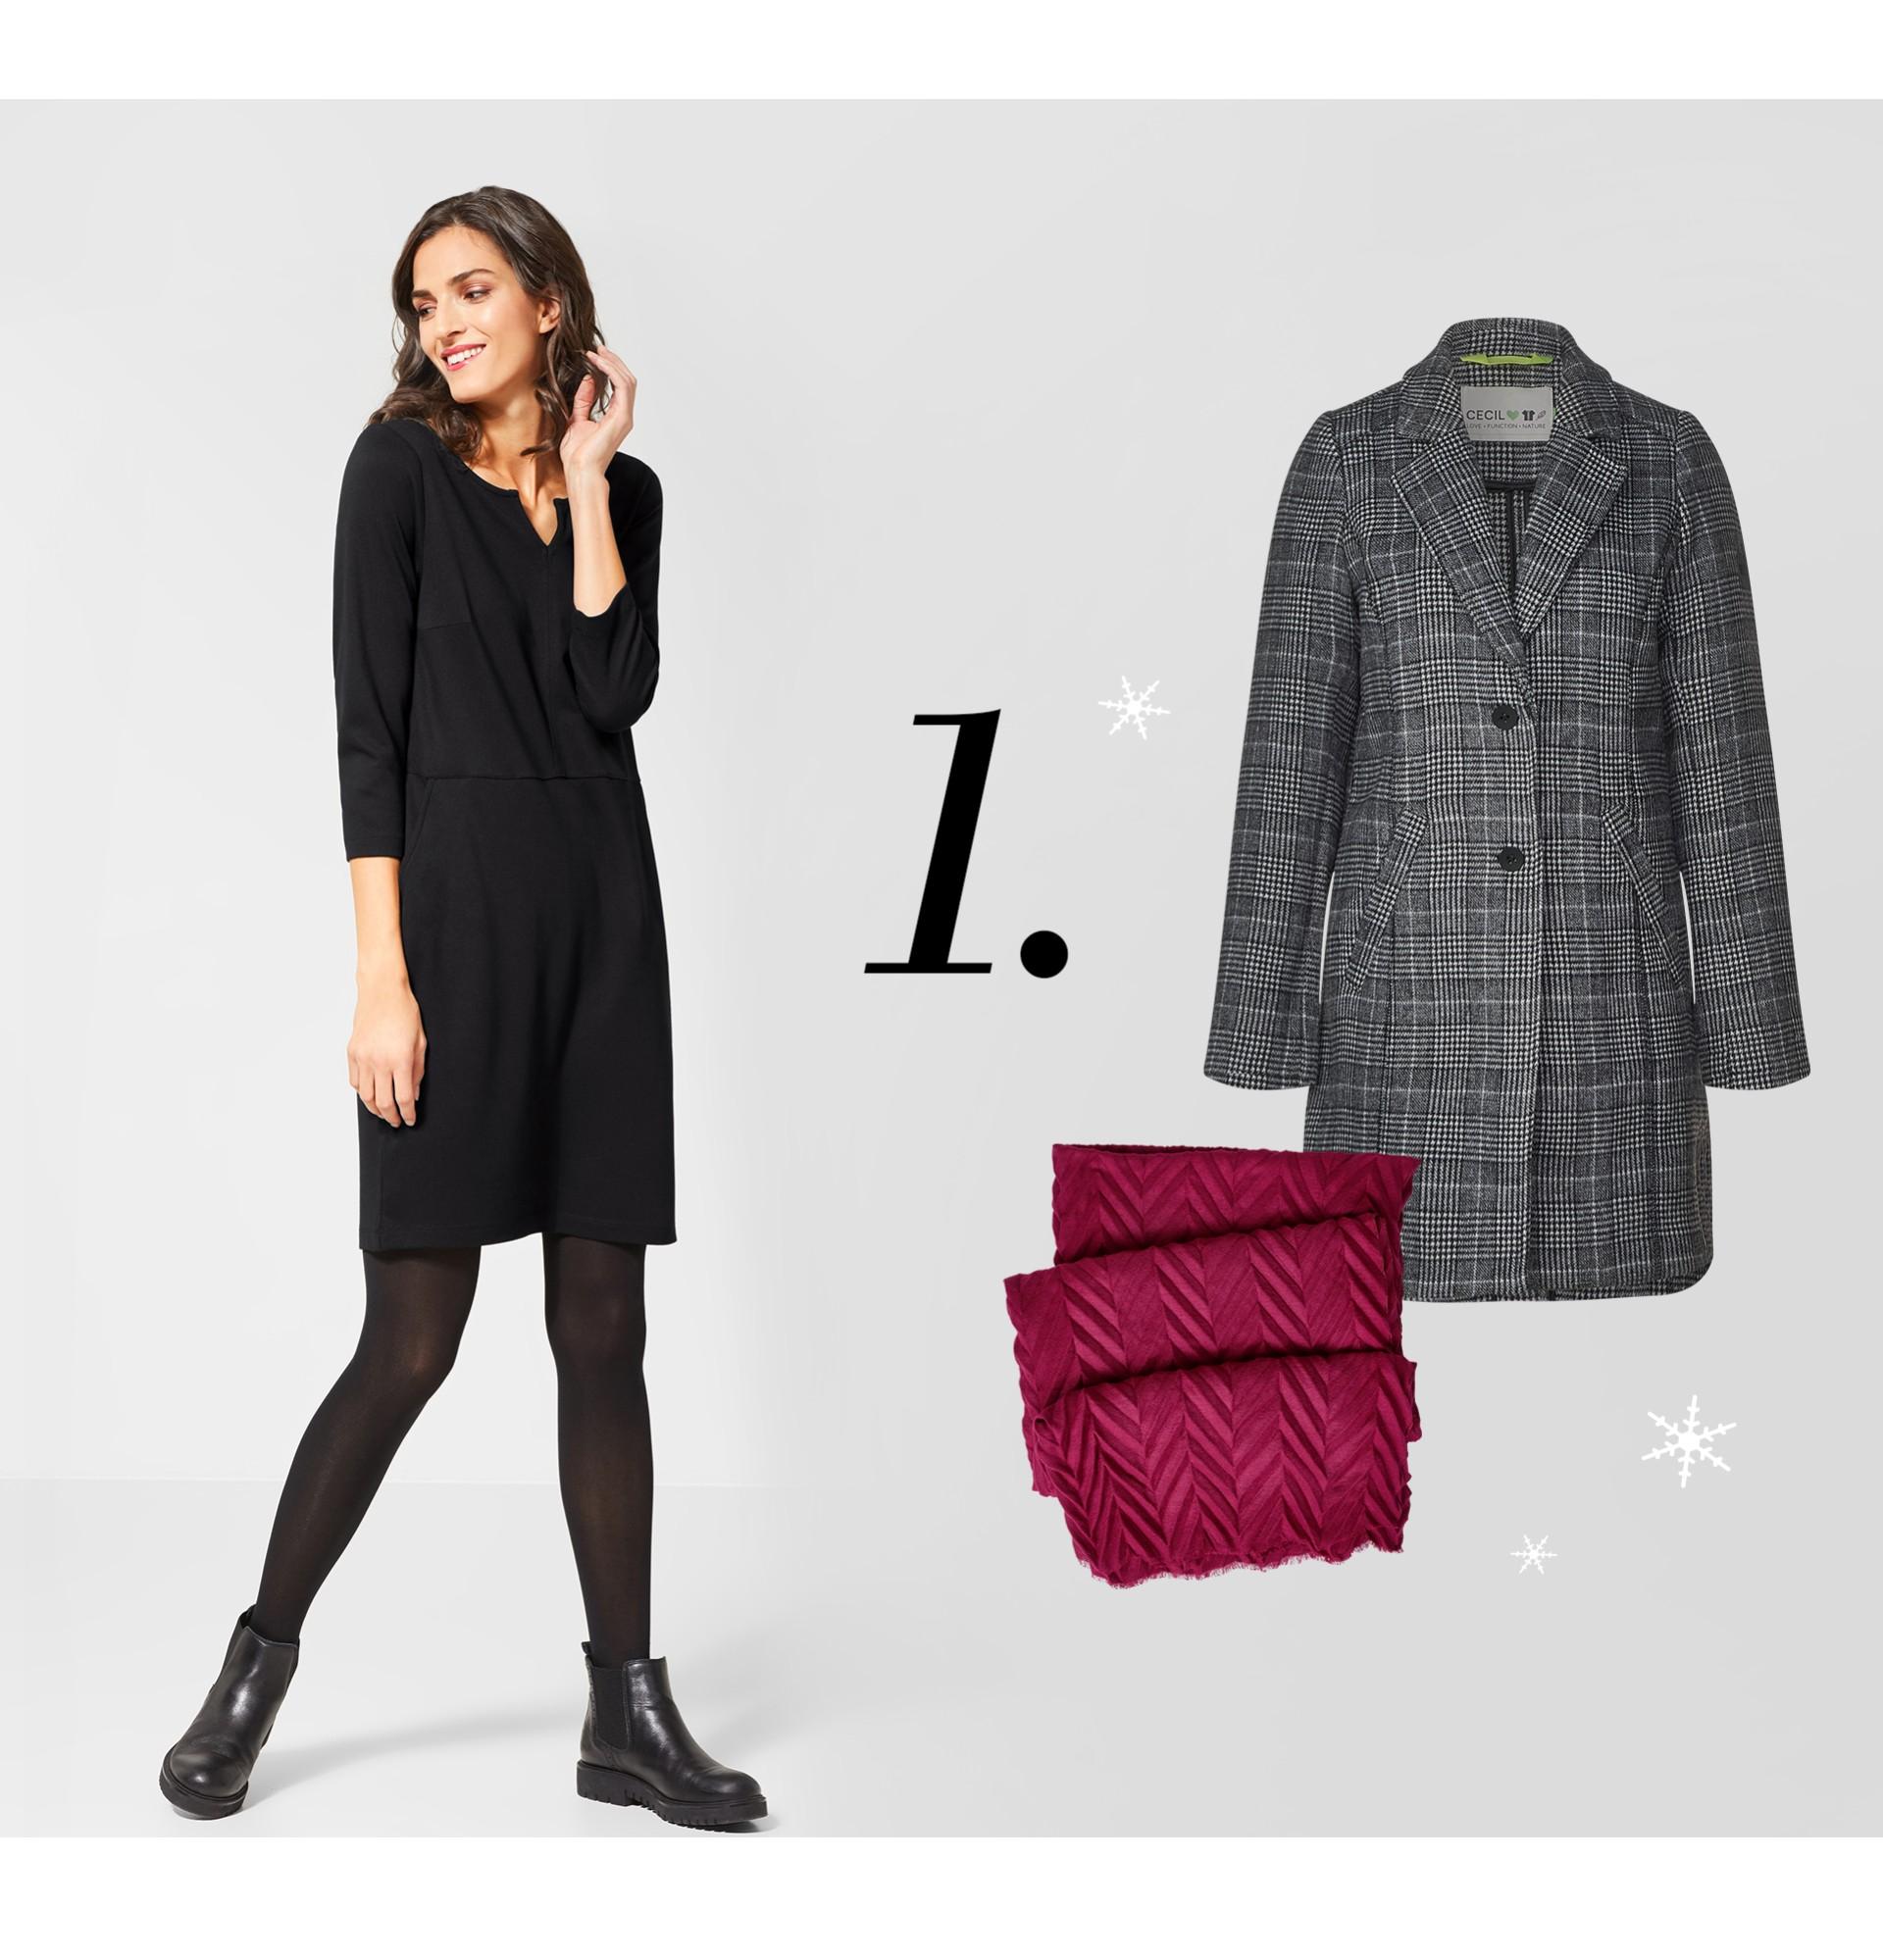 3 anlässe, 3 winter-outfits   cecil magazin